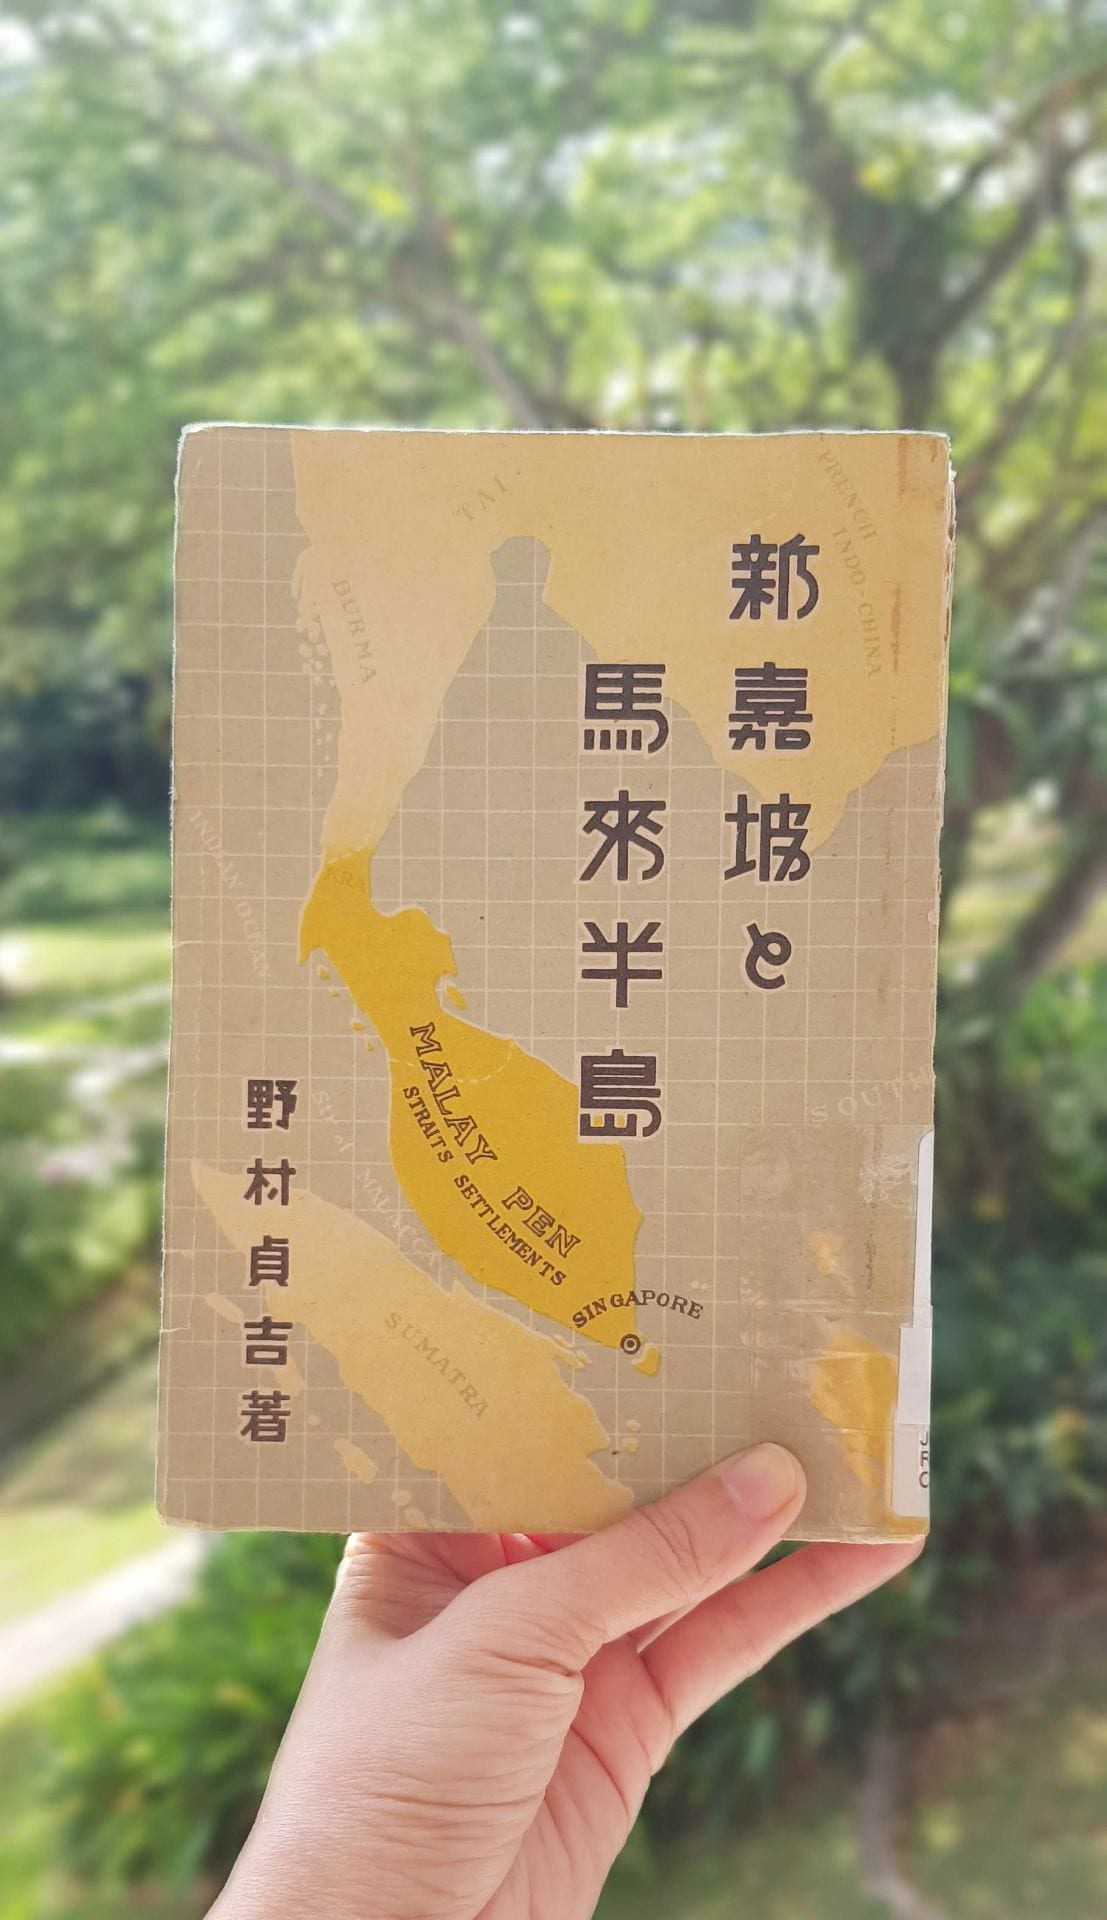 新嘉坡と馬来半島 book cover